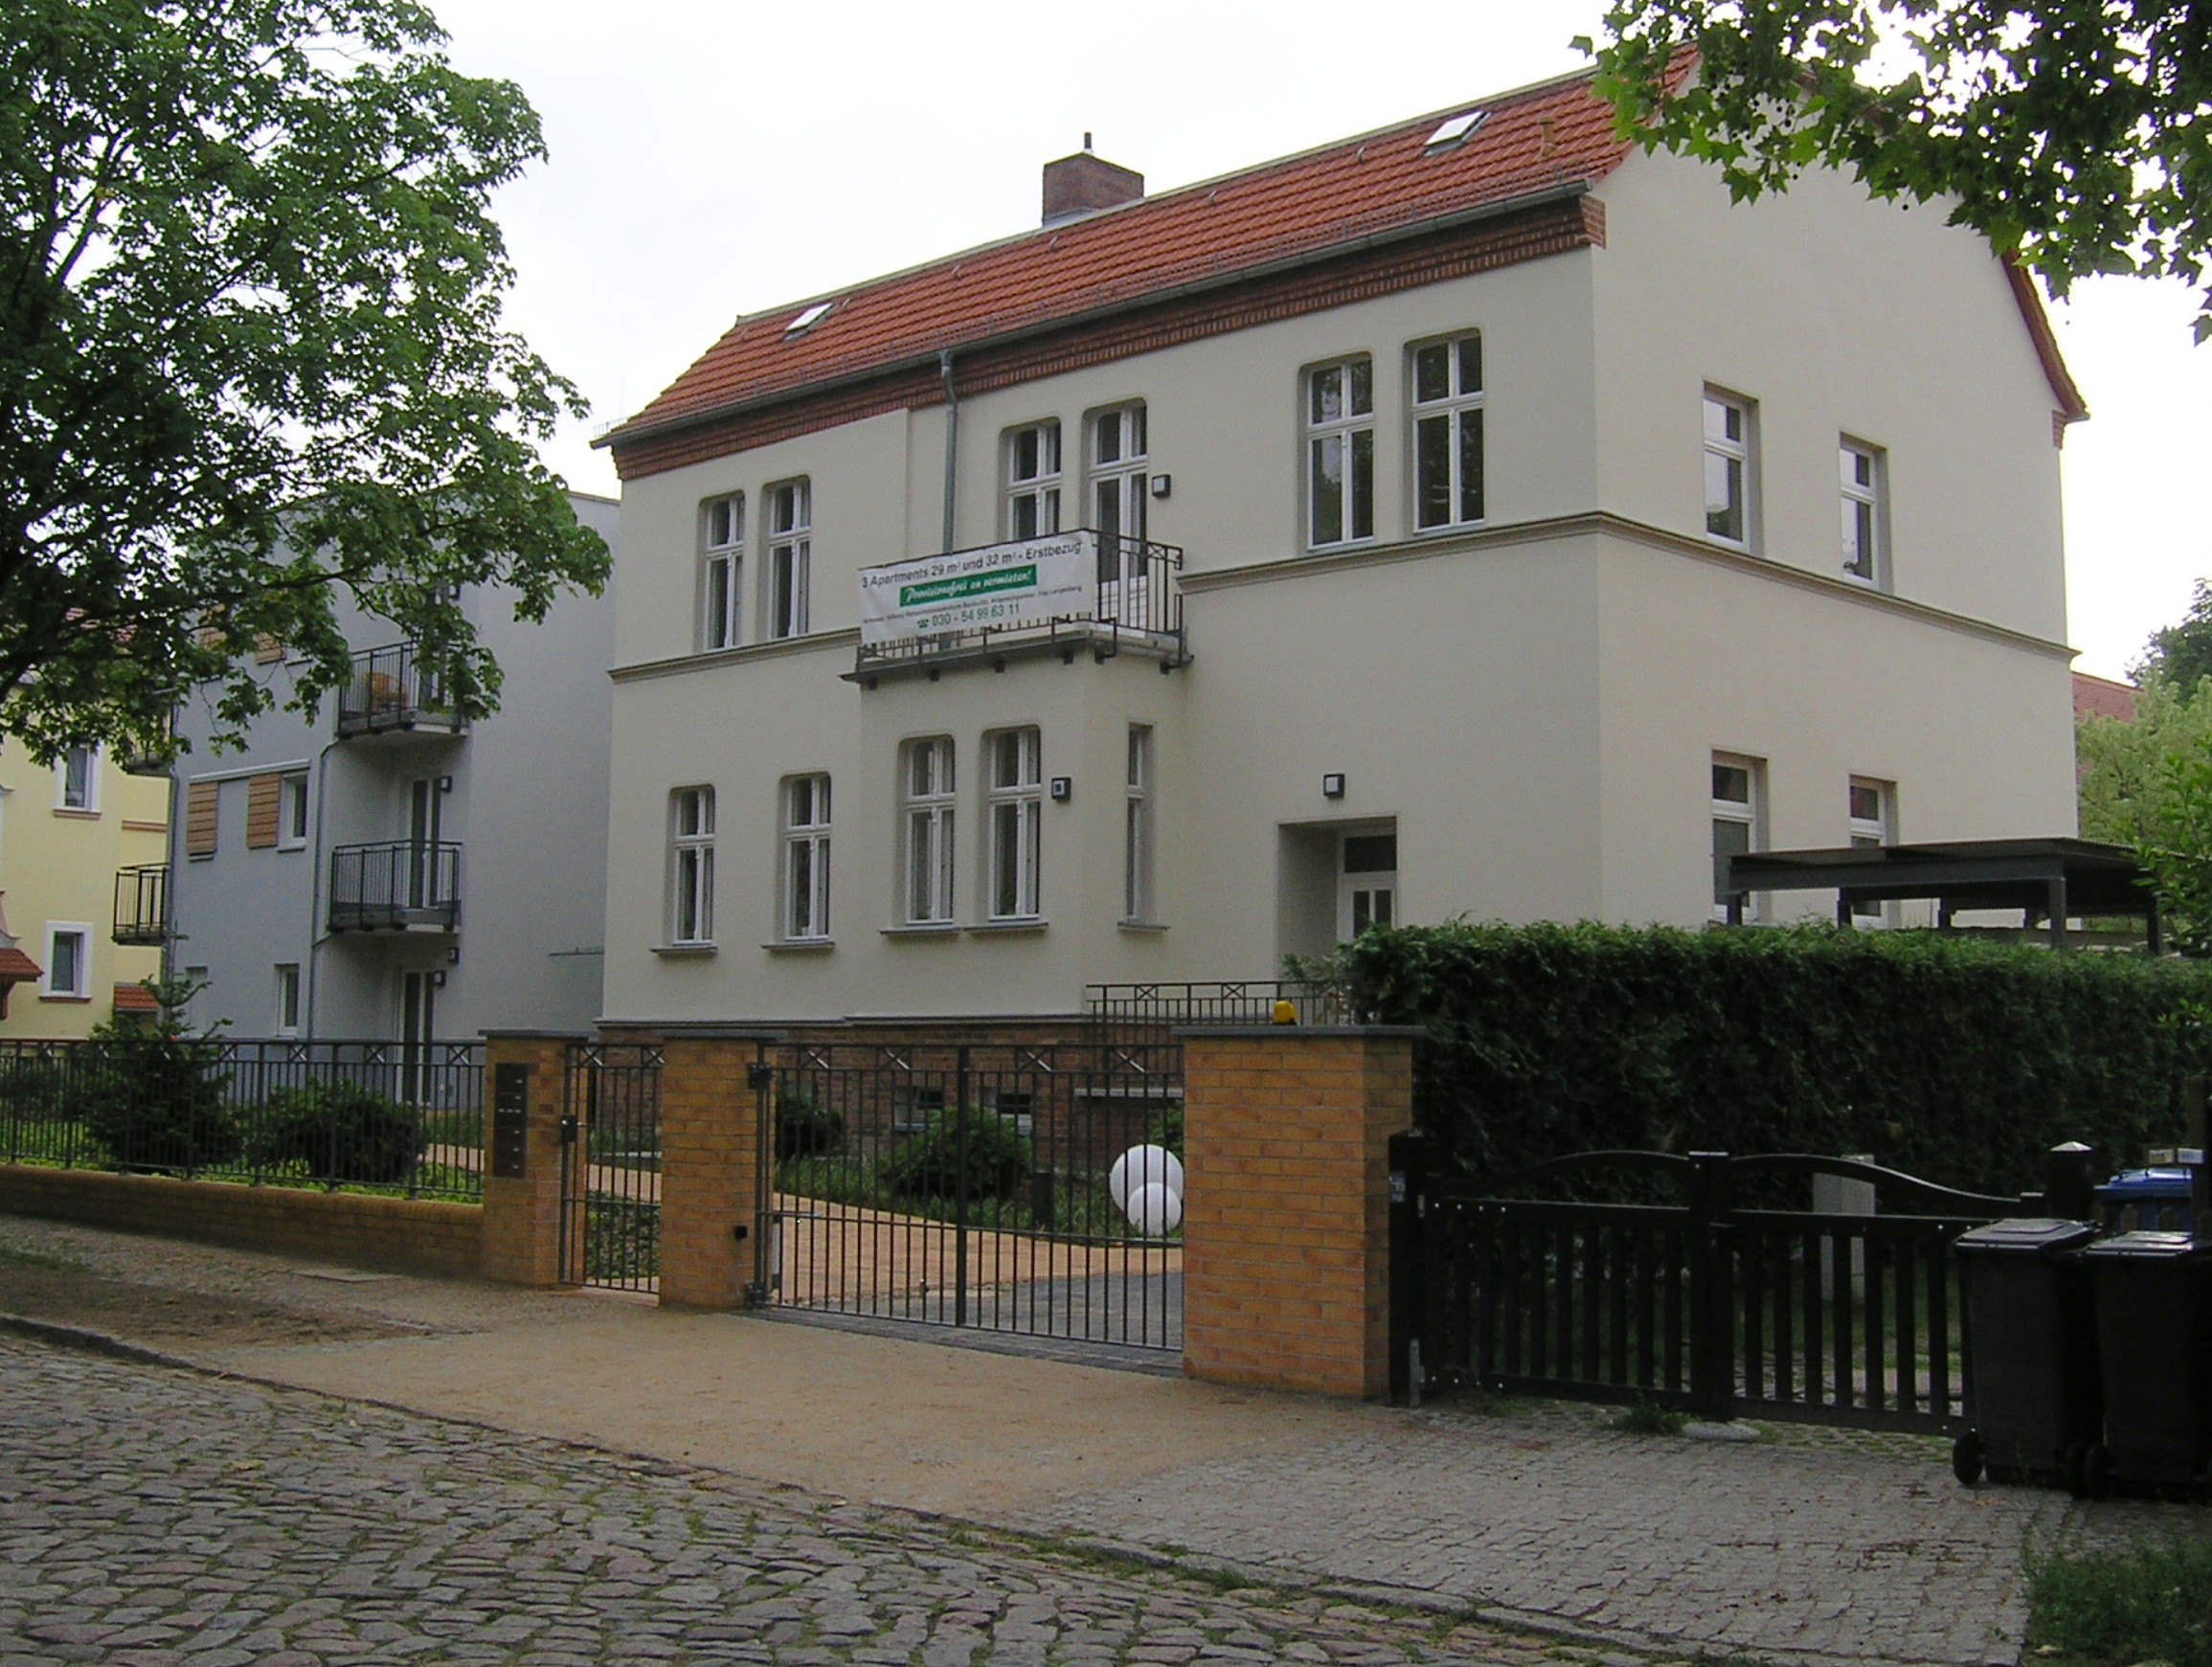 RBO Rehabiliationszentrum Berlin-Ost gGmbH , Allee der Kosmonauten 23A, 10315, Germany